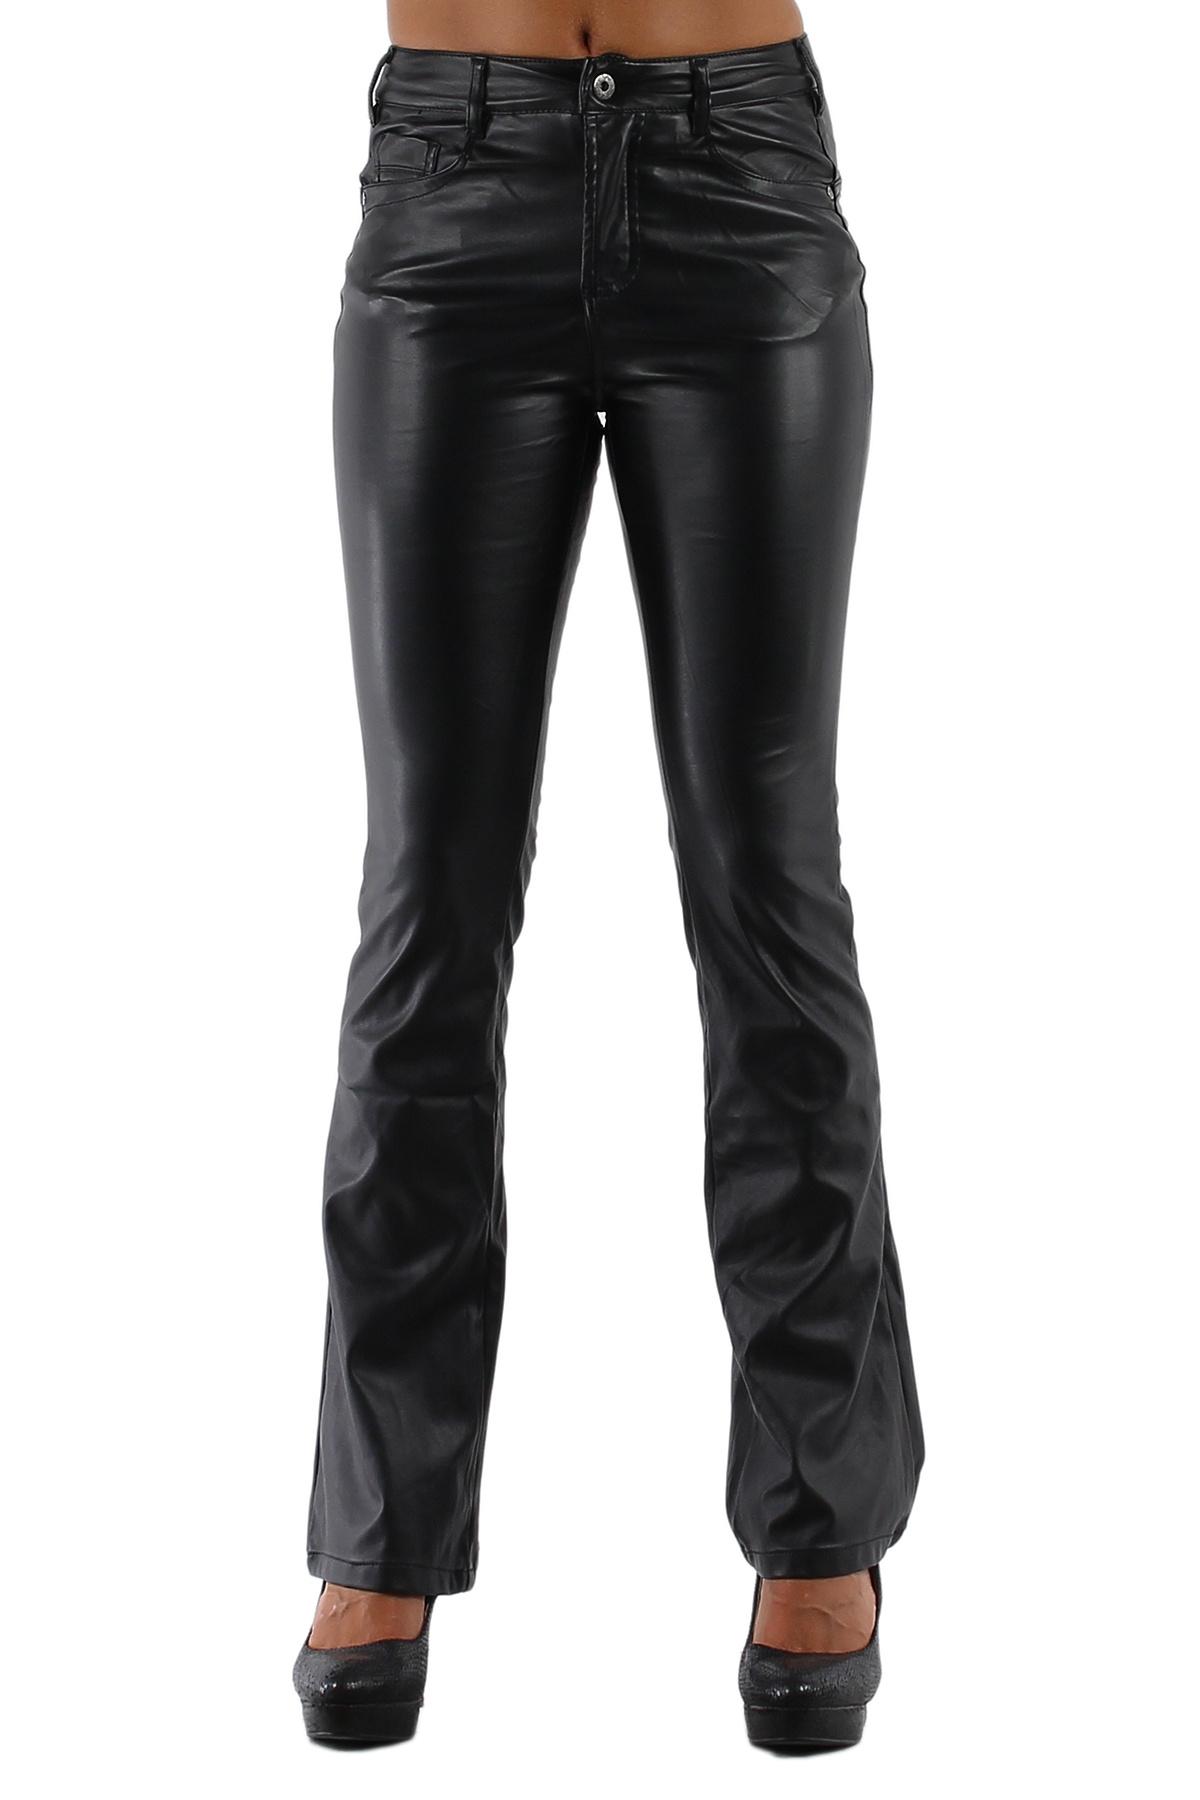 Broek hoge taille bootcut leder-imitatie Zwart